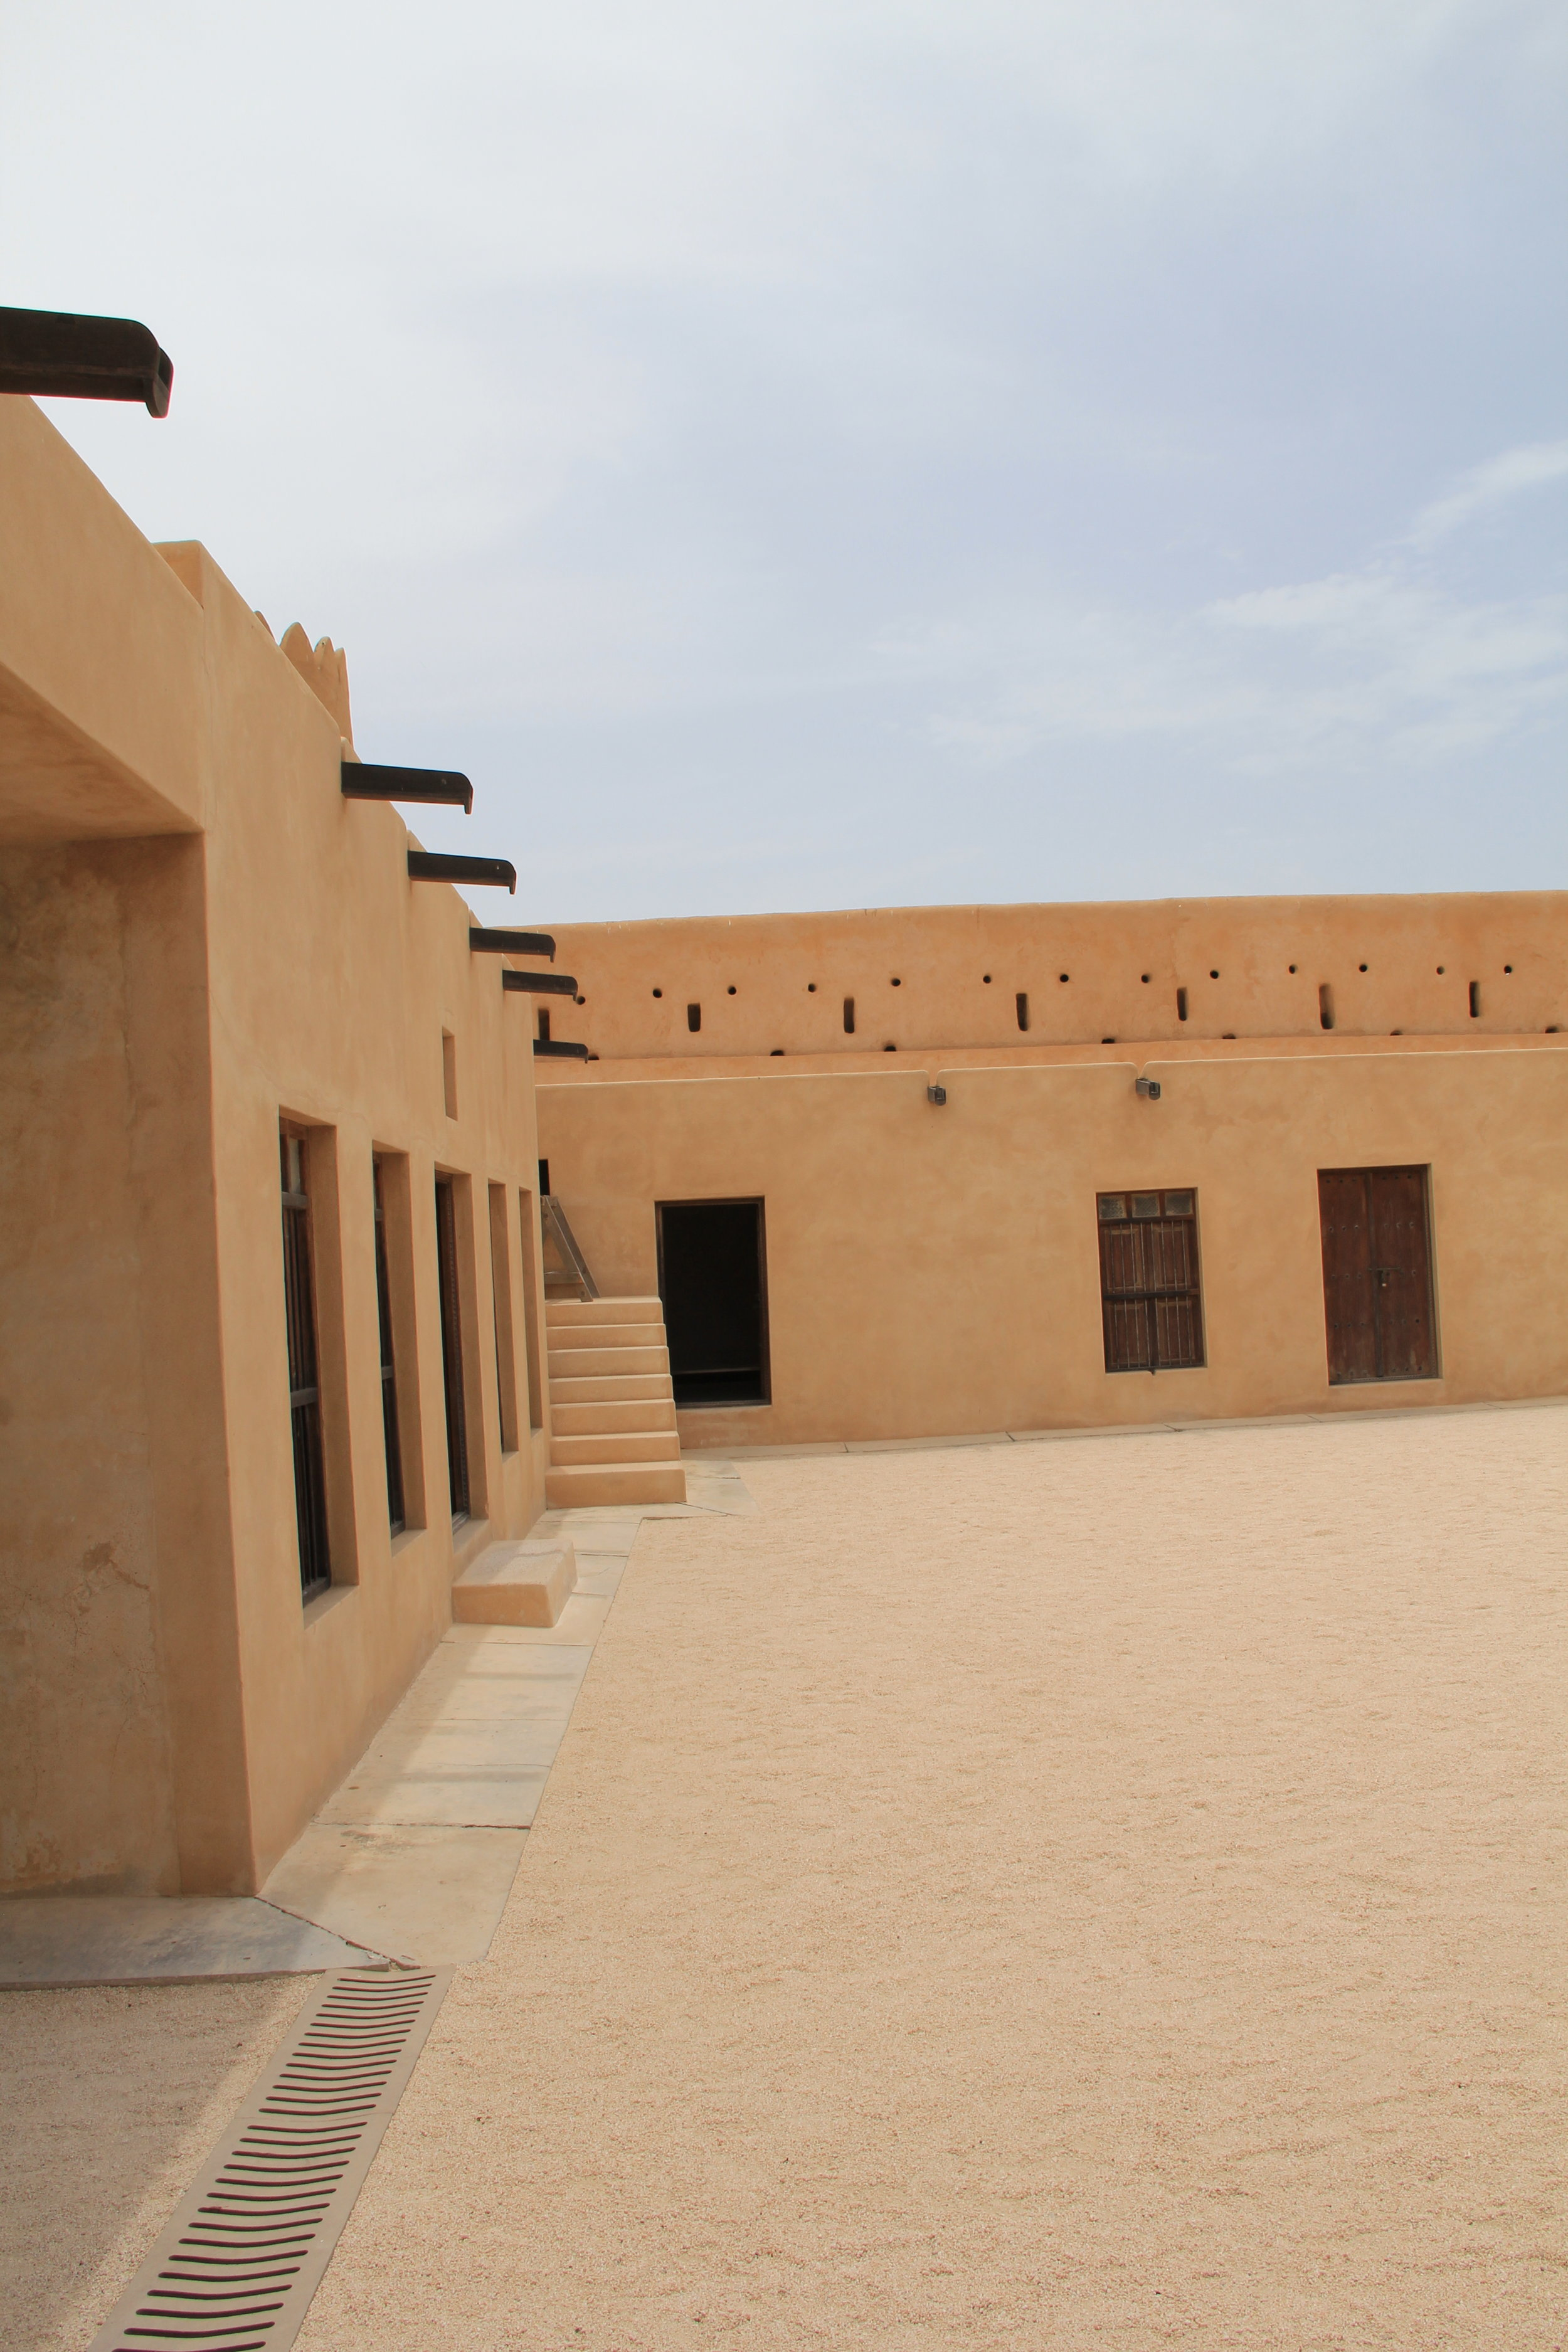 Al Zubara Fort, Al Zubara, Qatar. Taken by Tyanna LC